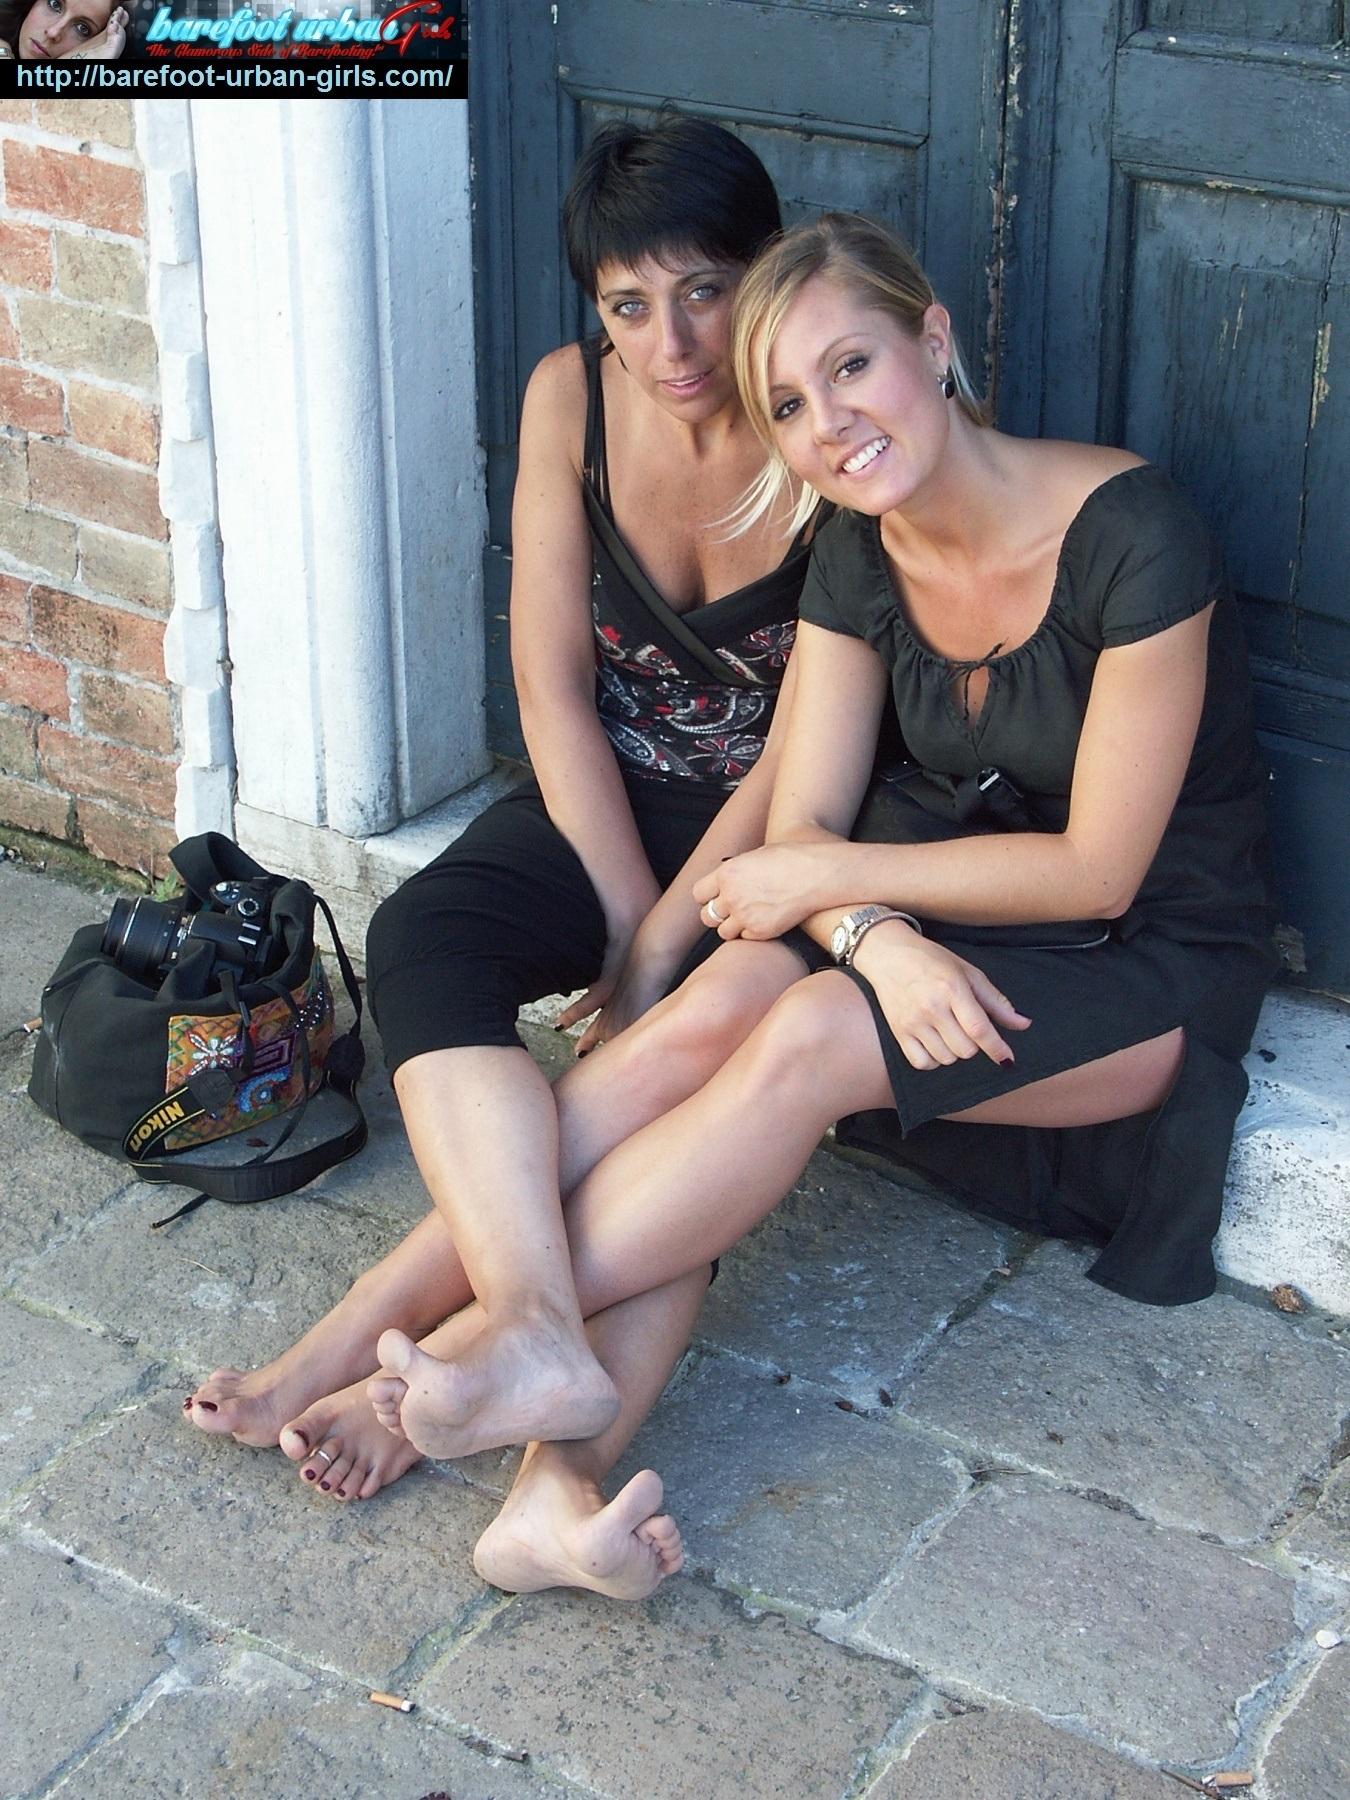 Foot Fetish Forum: AMANDA & VIOLACEA: barefooting in cold